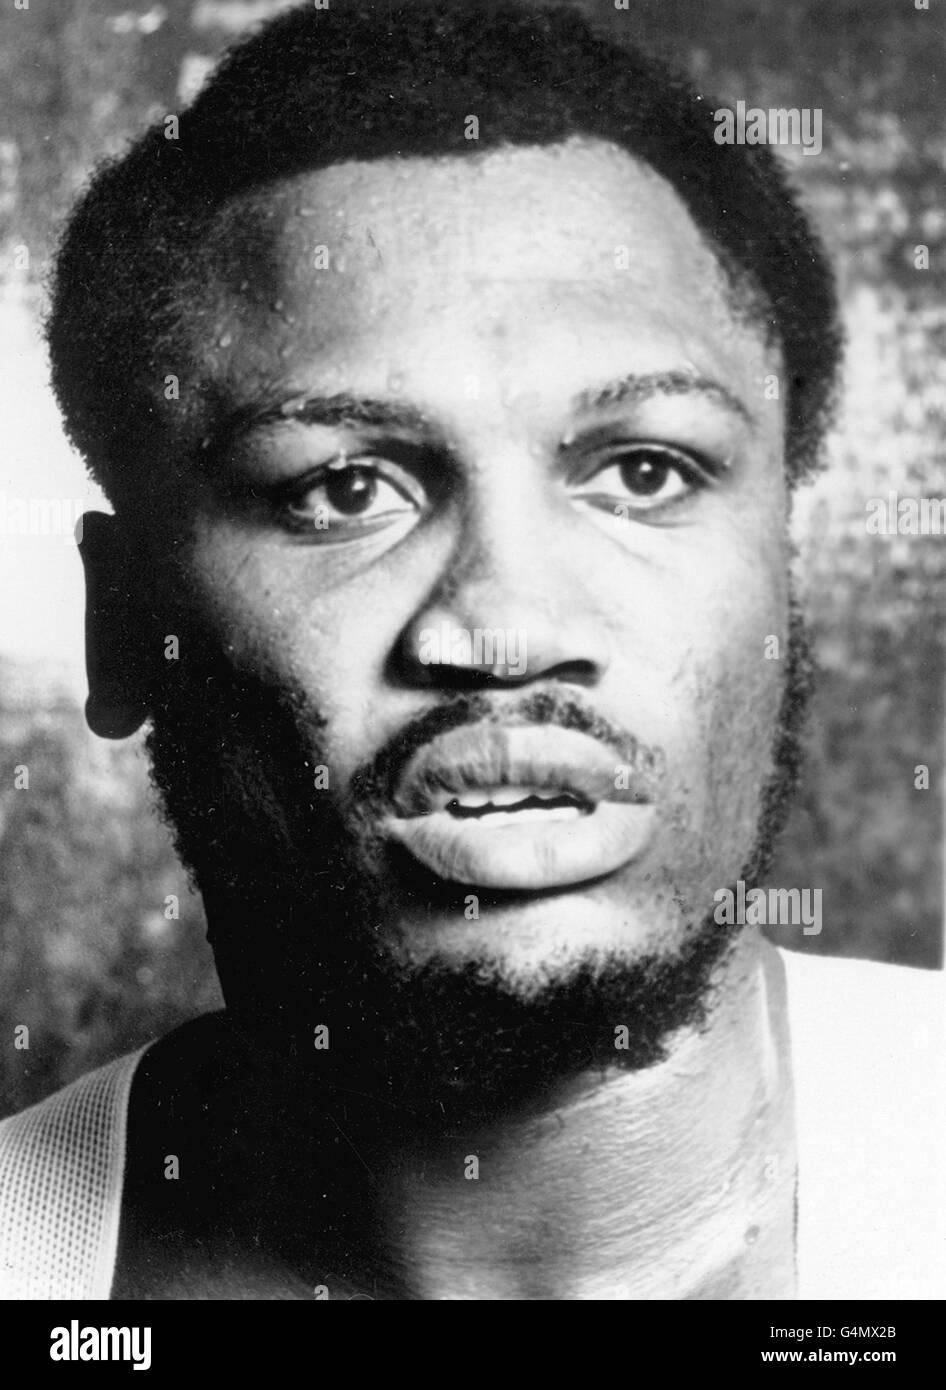 Boxing - Heavyweight - Joe Frazier - Stock Image